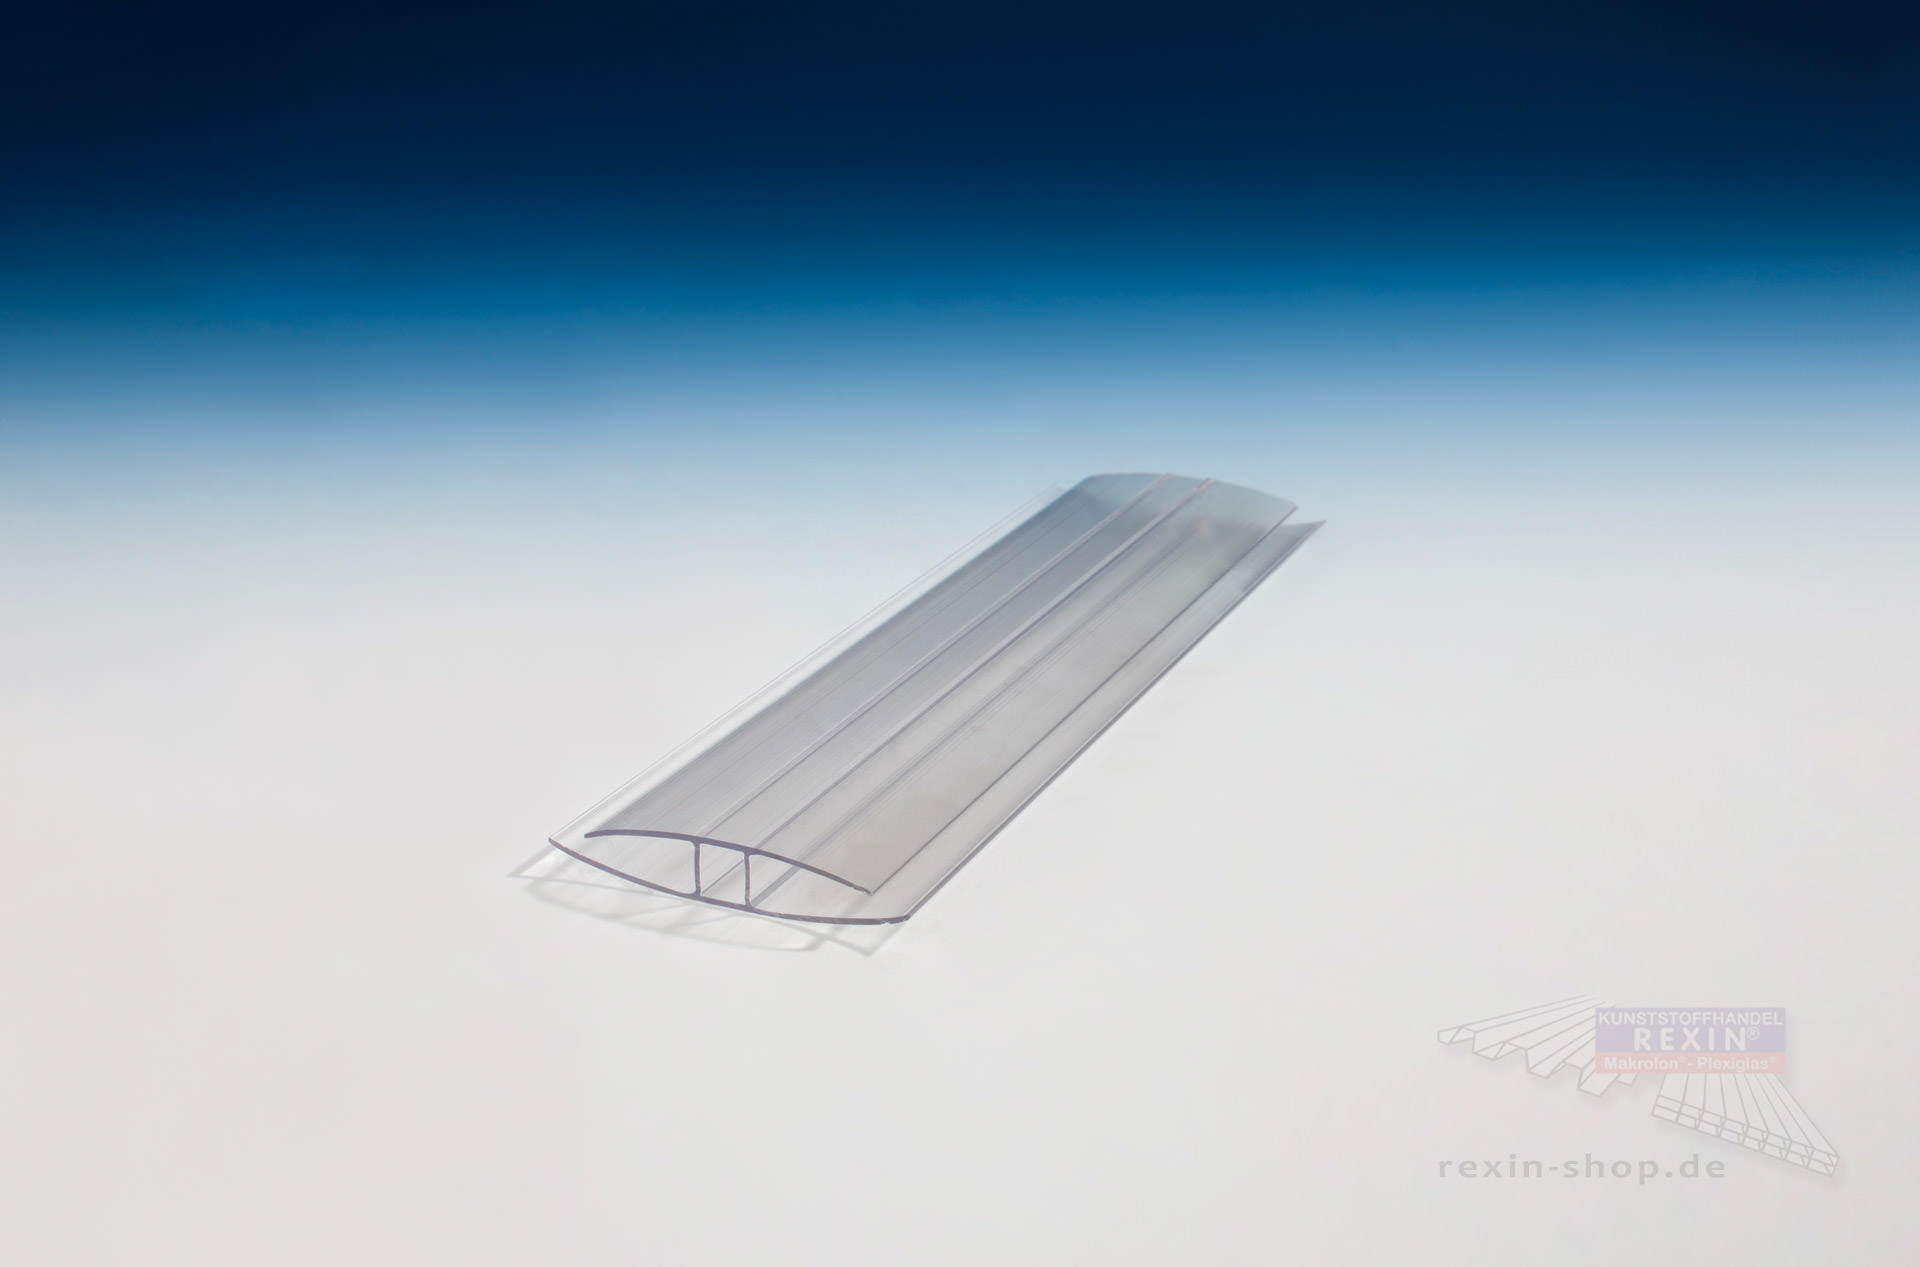 h profil aus polycarbonat transparent f r 10mm platten. Black Bedroom Furniture Sets. Home Design Ideas